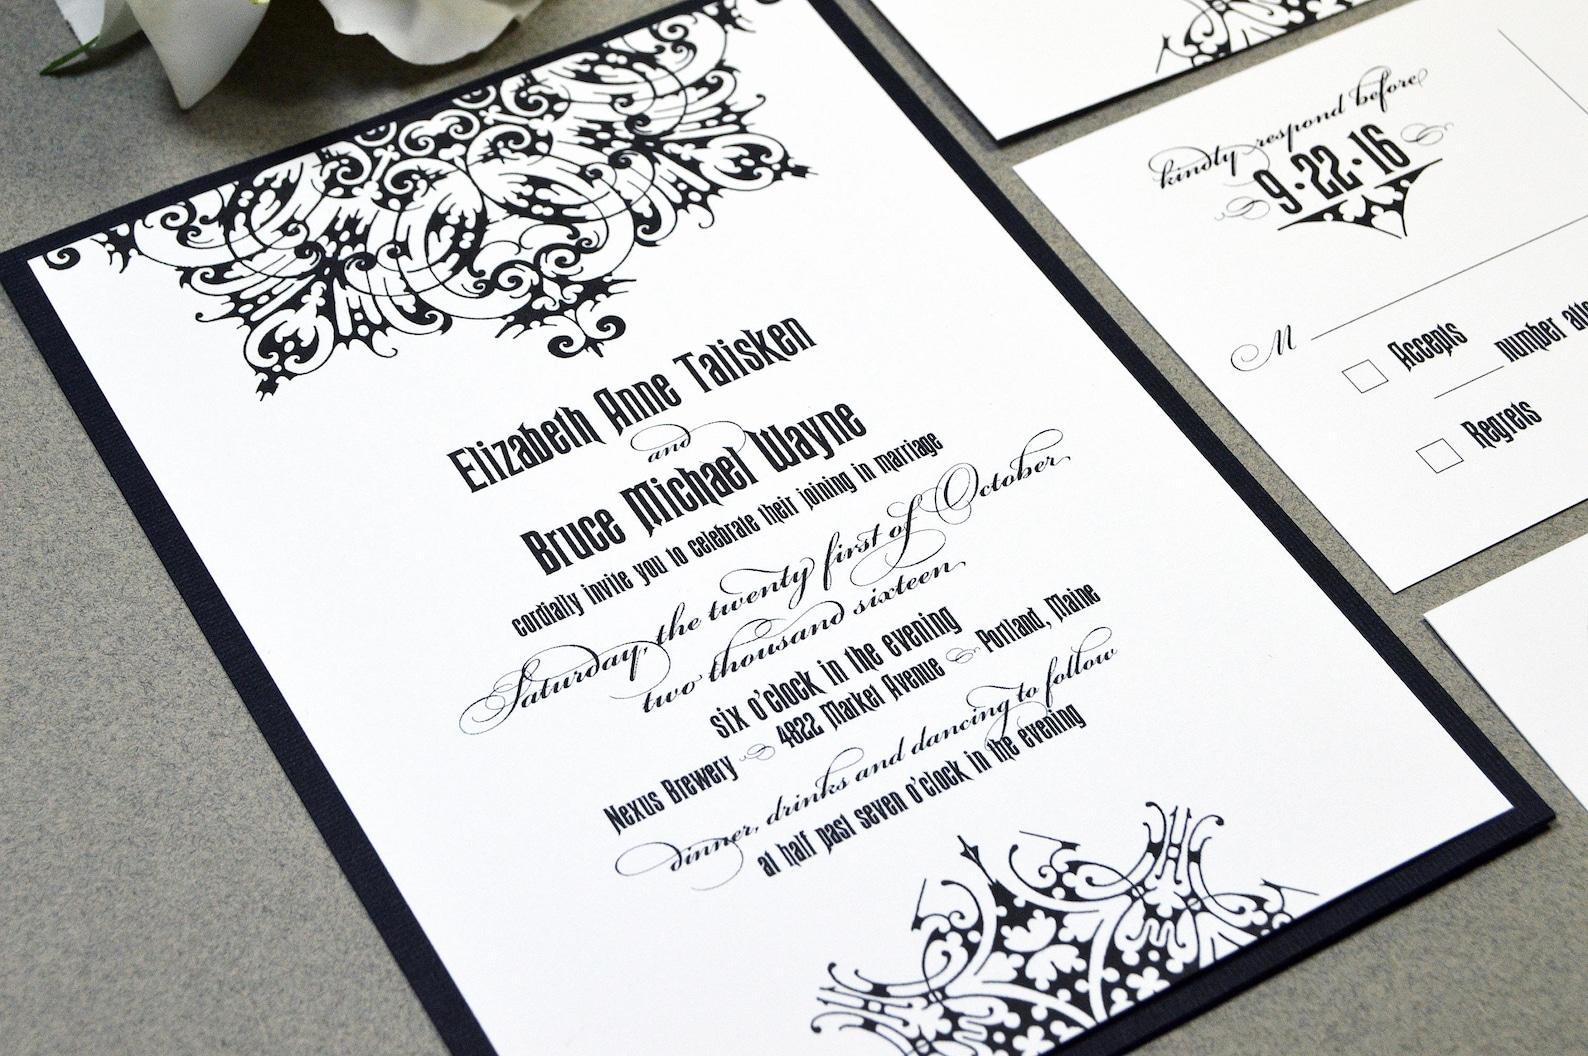 medieval wedding invitations - HD1588×1056